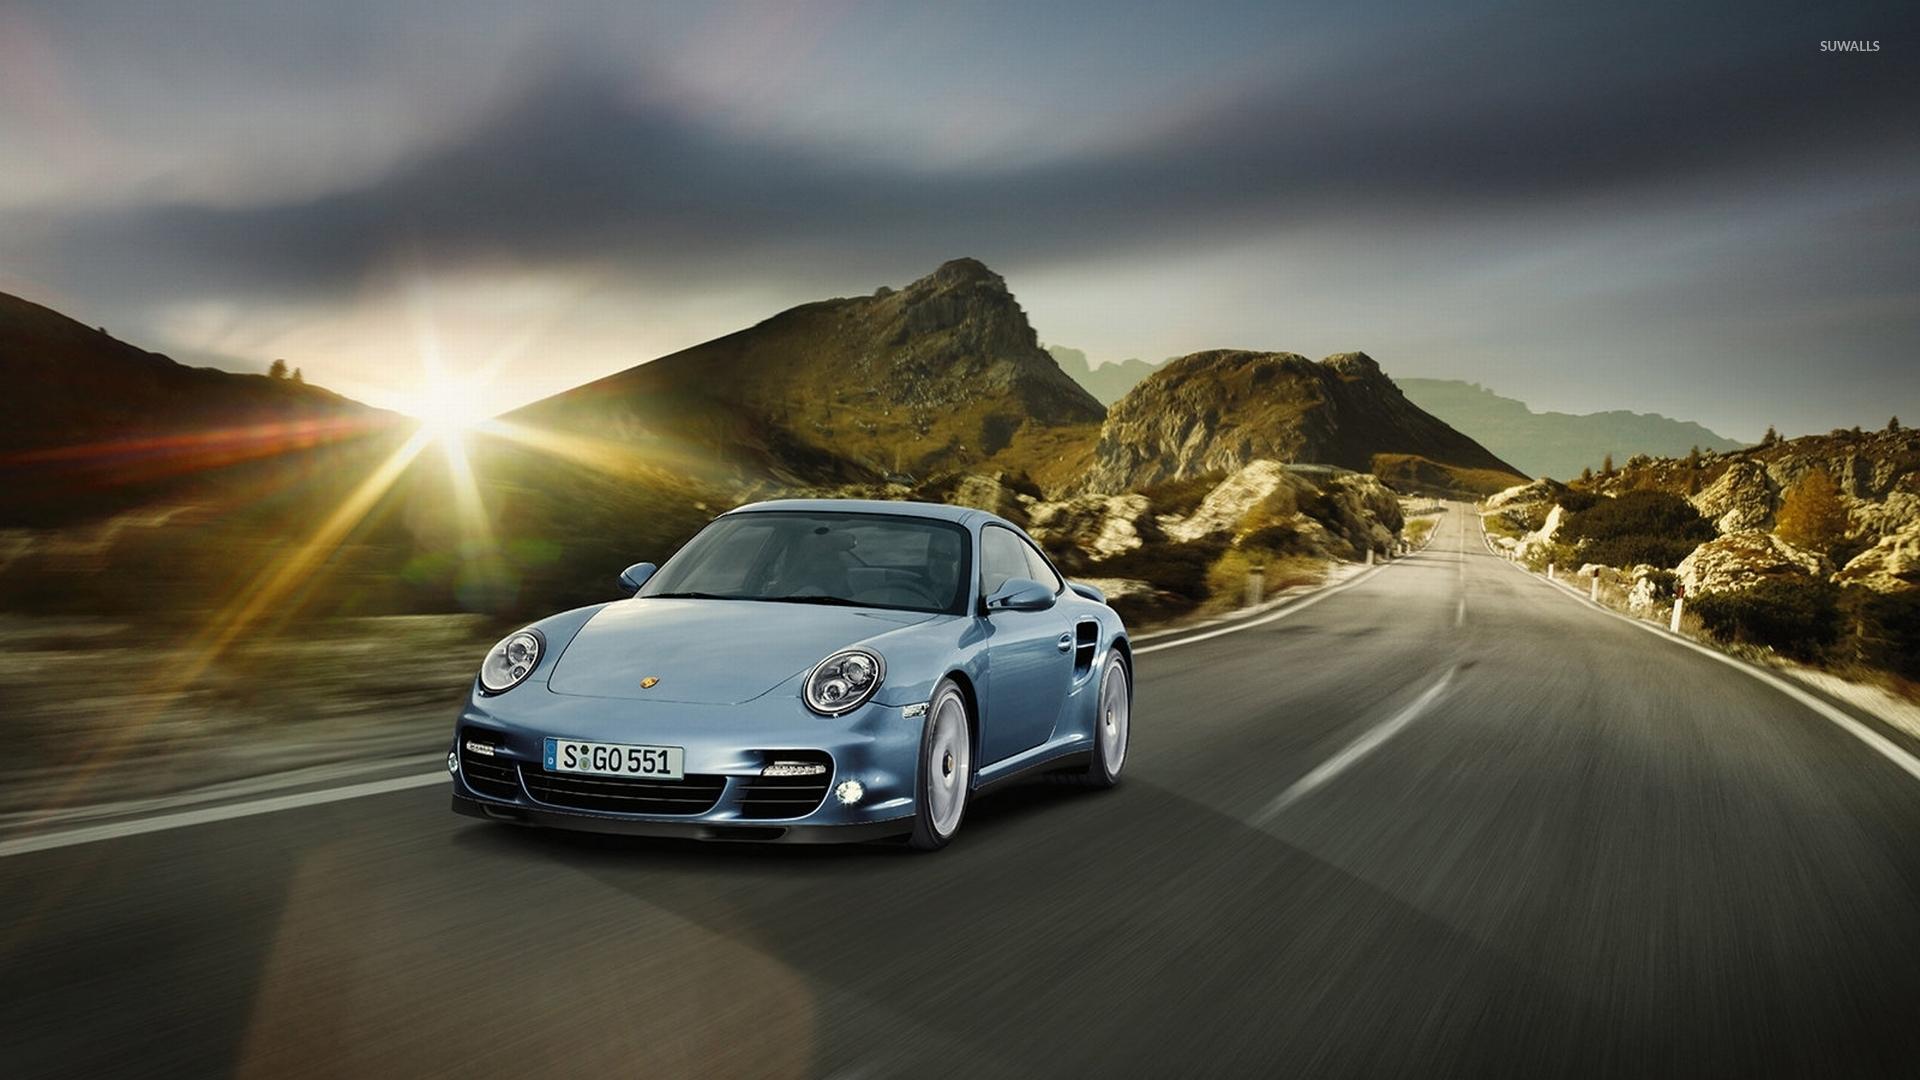 2011 Porsche 911 Turbo S wallpaper